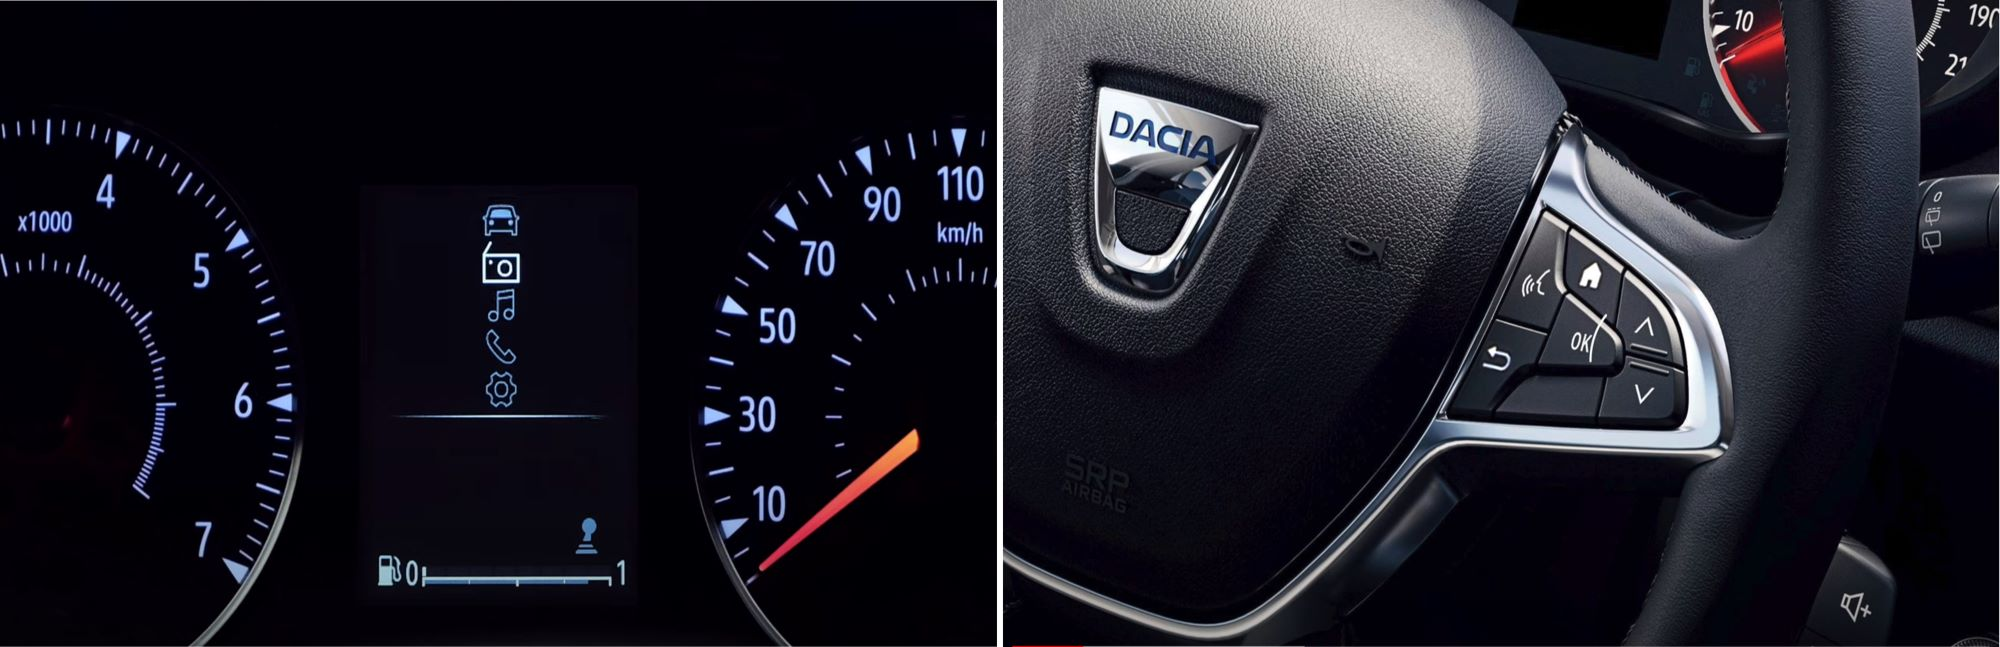 media control Dacia Sandero